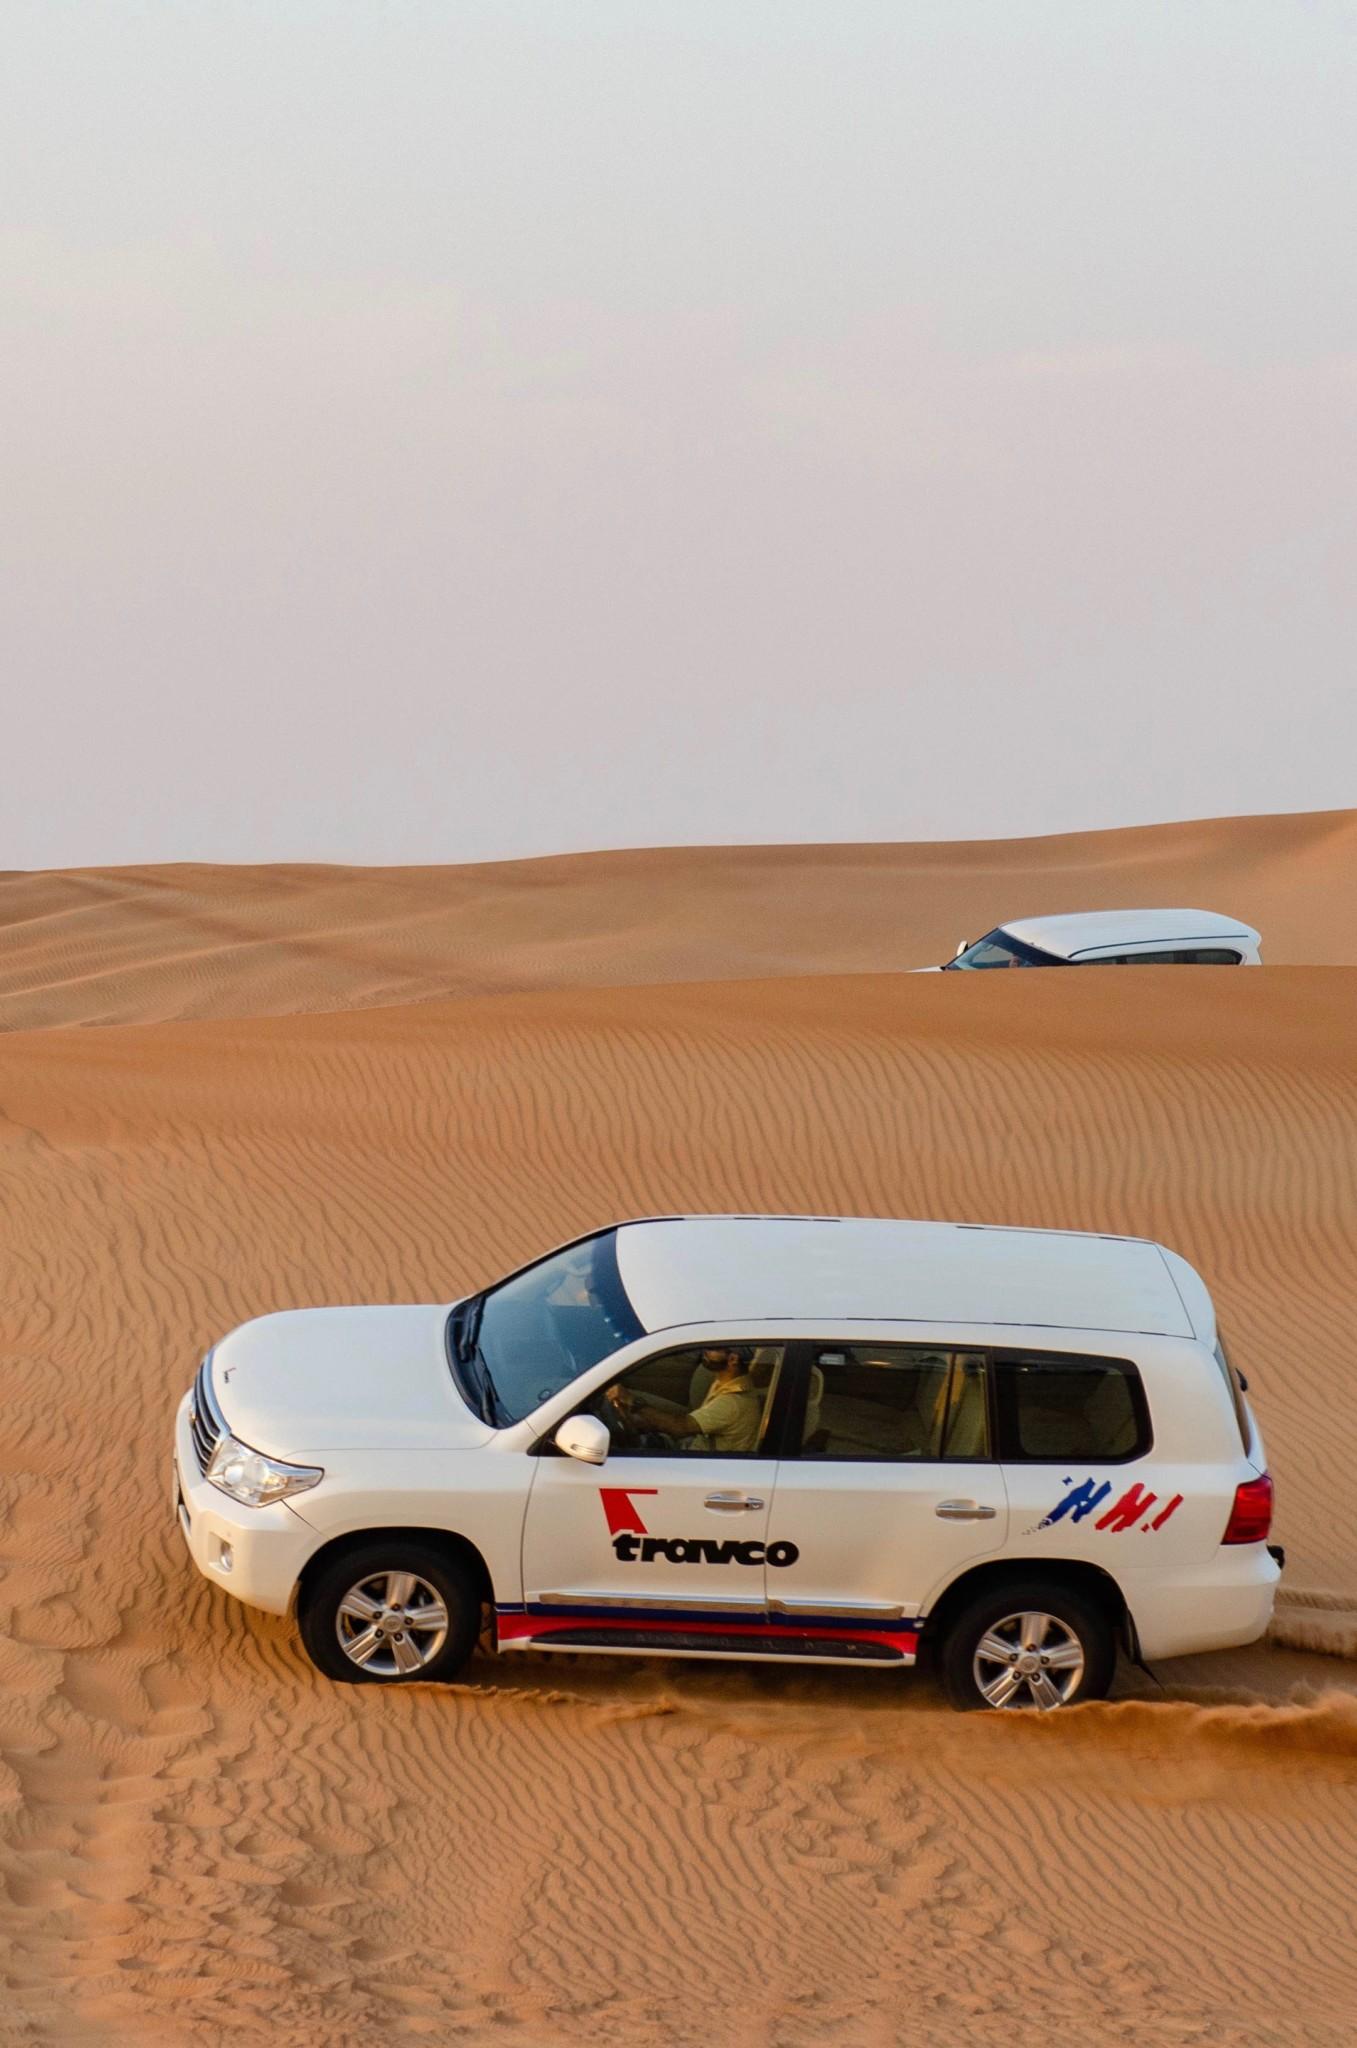 Jeepsafari in Dubai